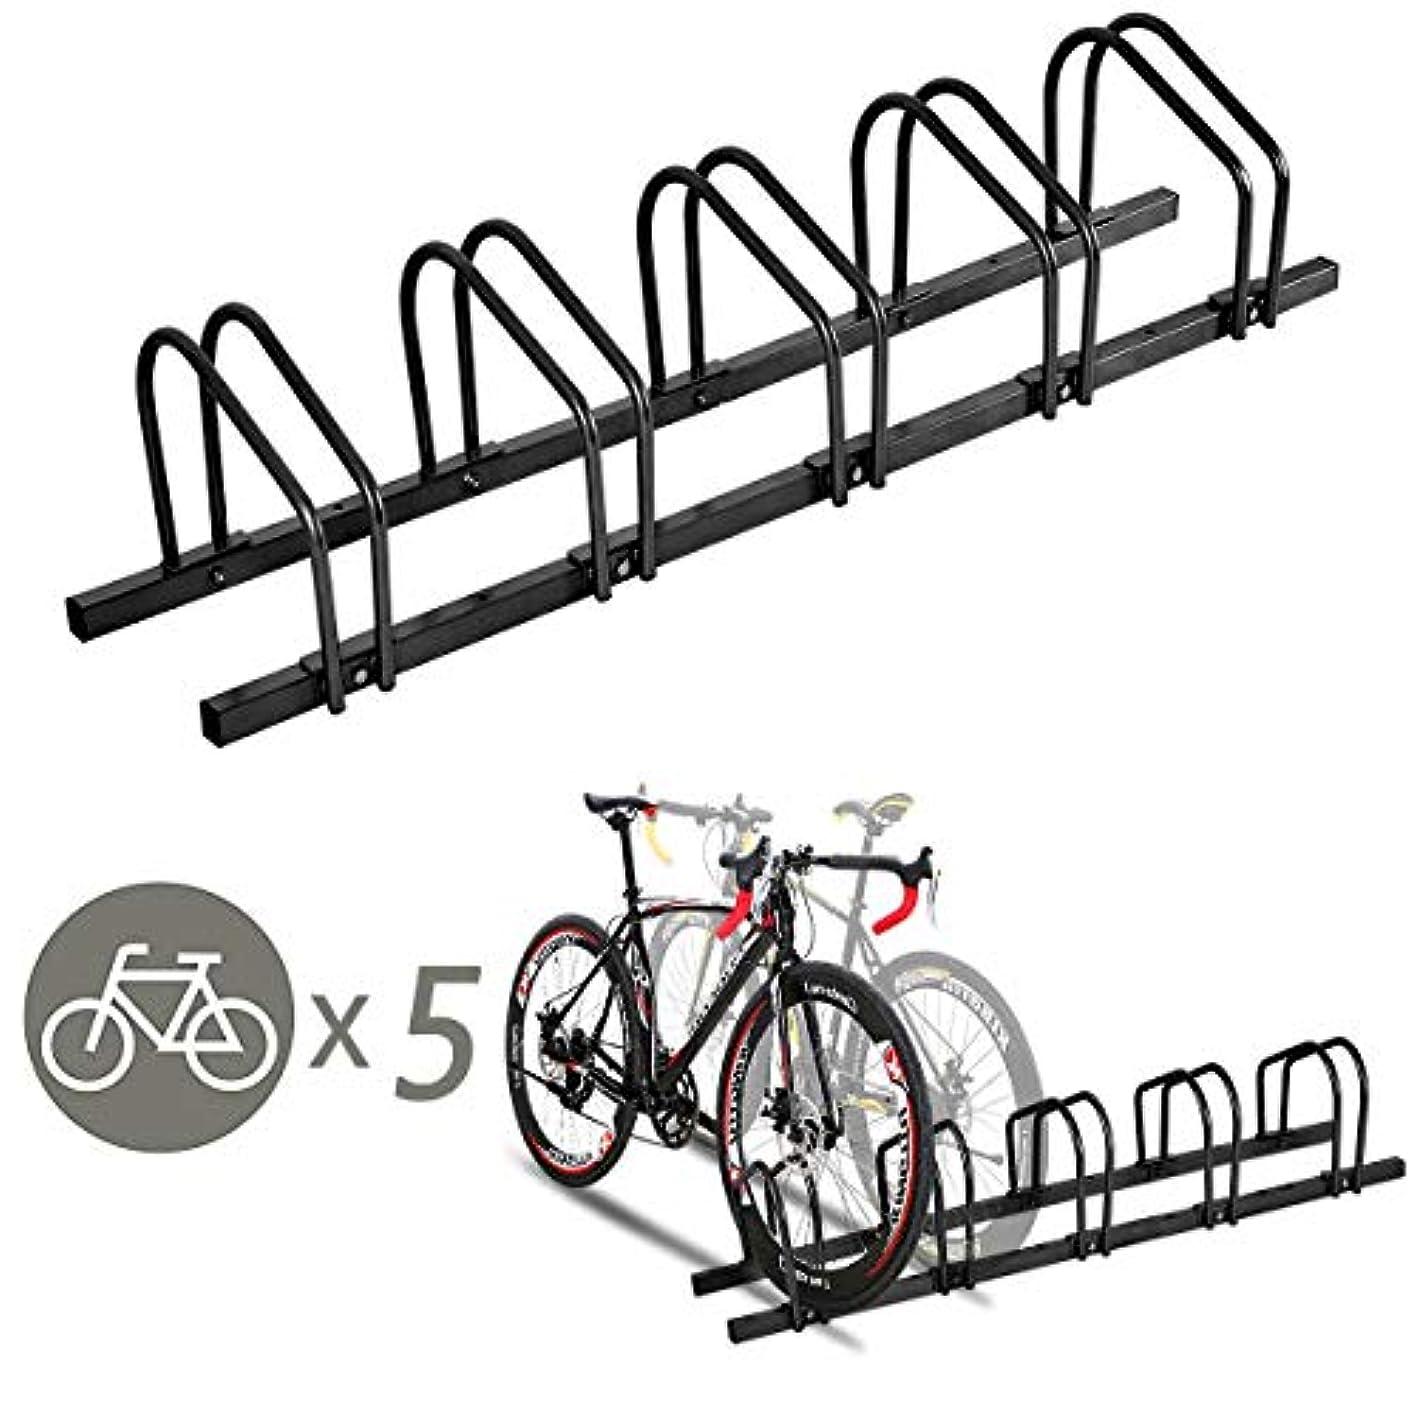 5 Bike Rack Bike Bicycle Stand Parking Garage Storage Organizer Cycling Rack Black